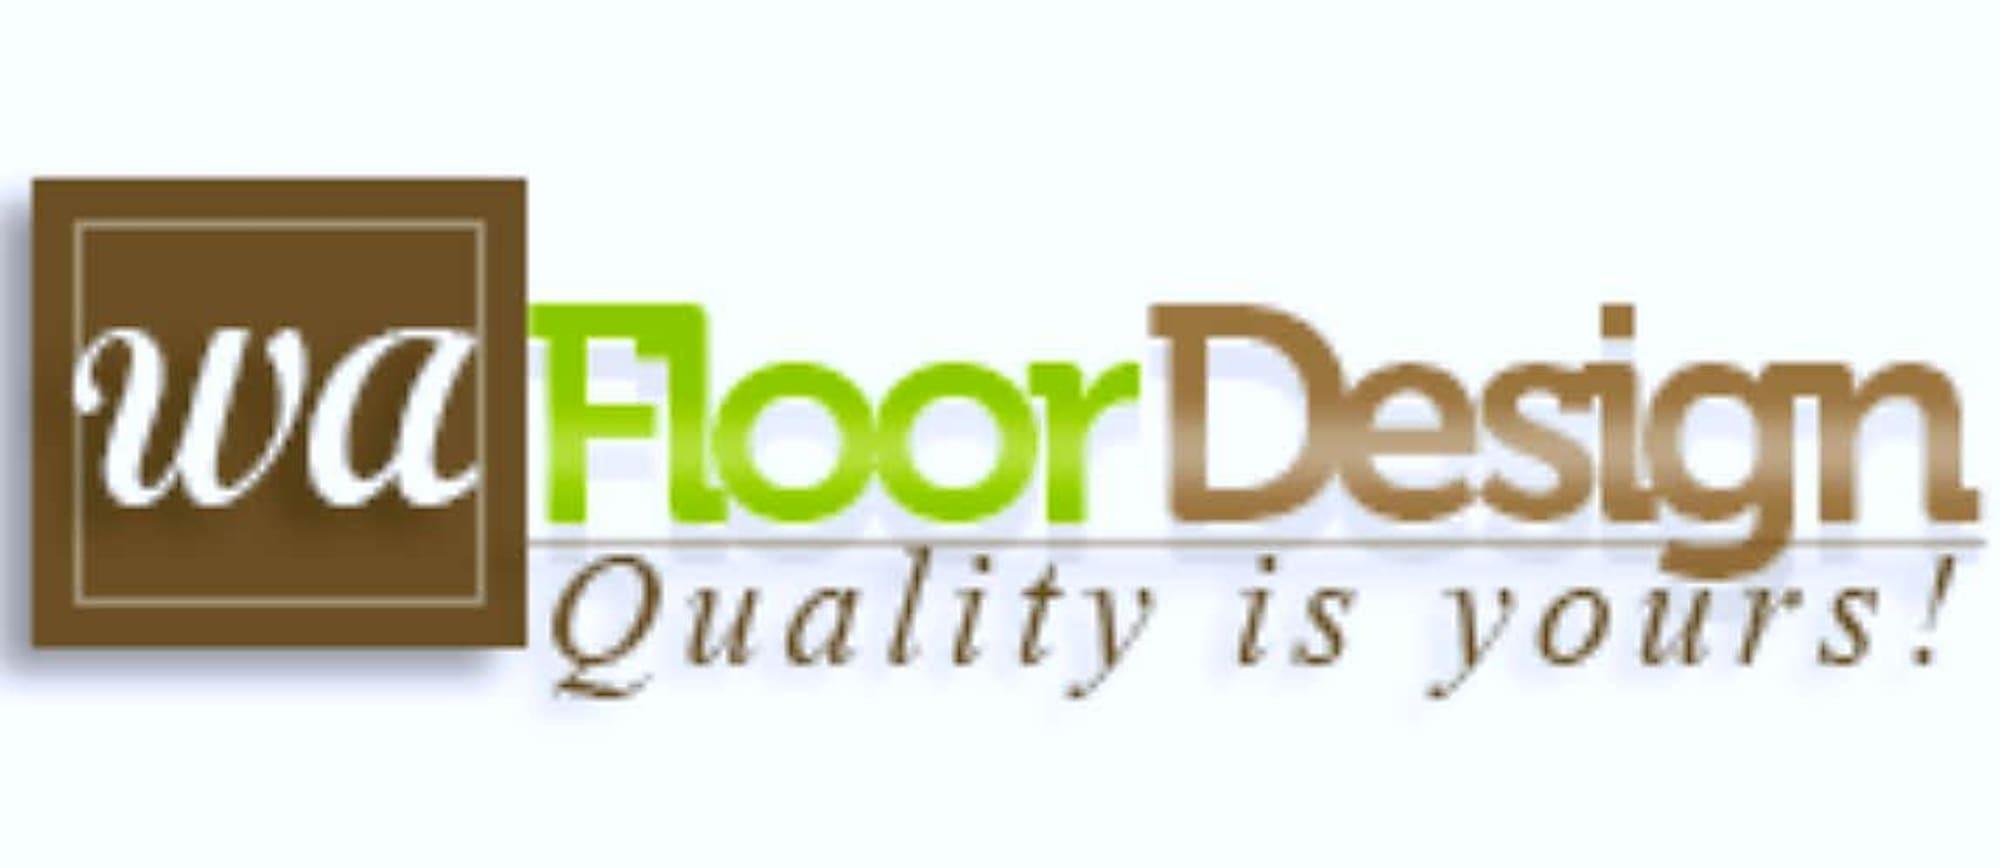 WA Floor Design LLC - 34829 SE Kinsey St i204 Snoqualmie, WA 98065